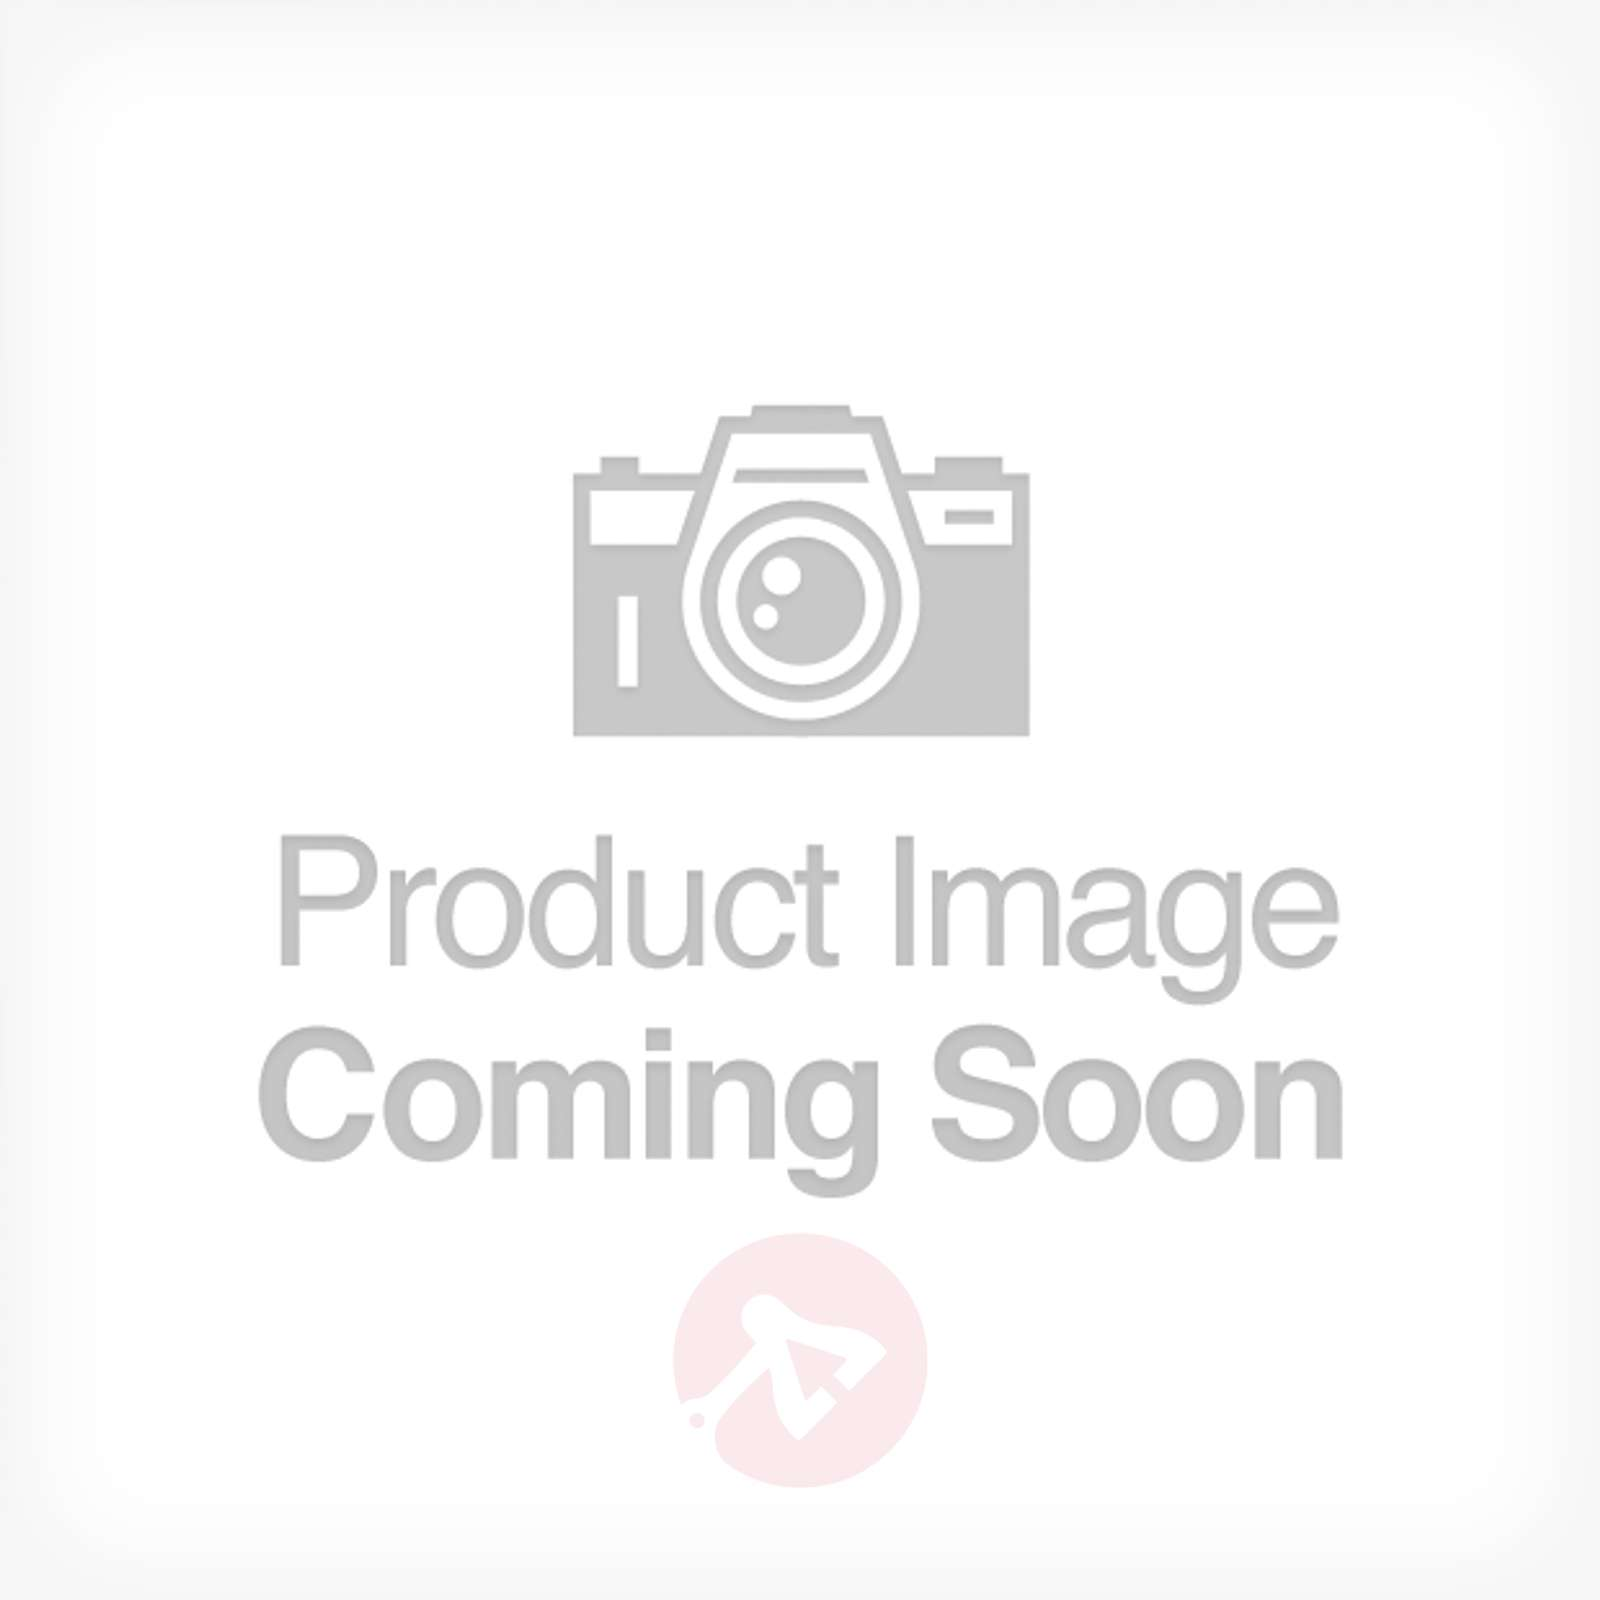 Lumiefekti-valoverho LED jäätävä sade-5524821X-01